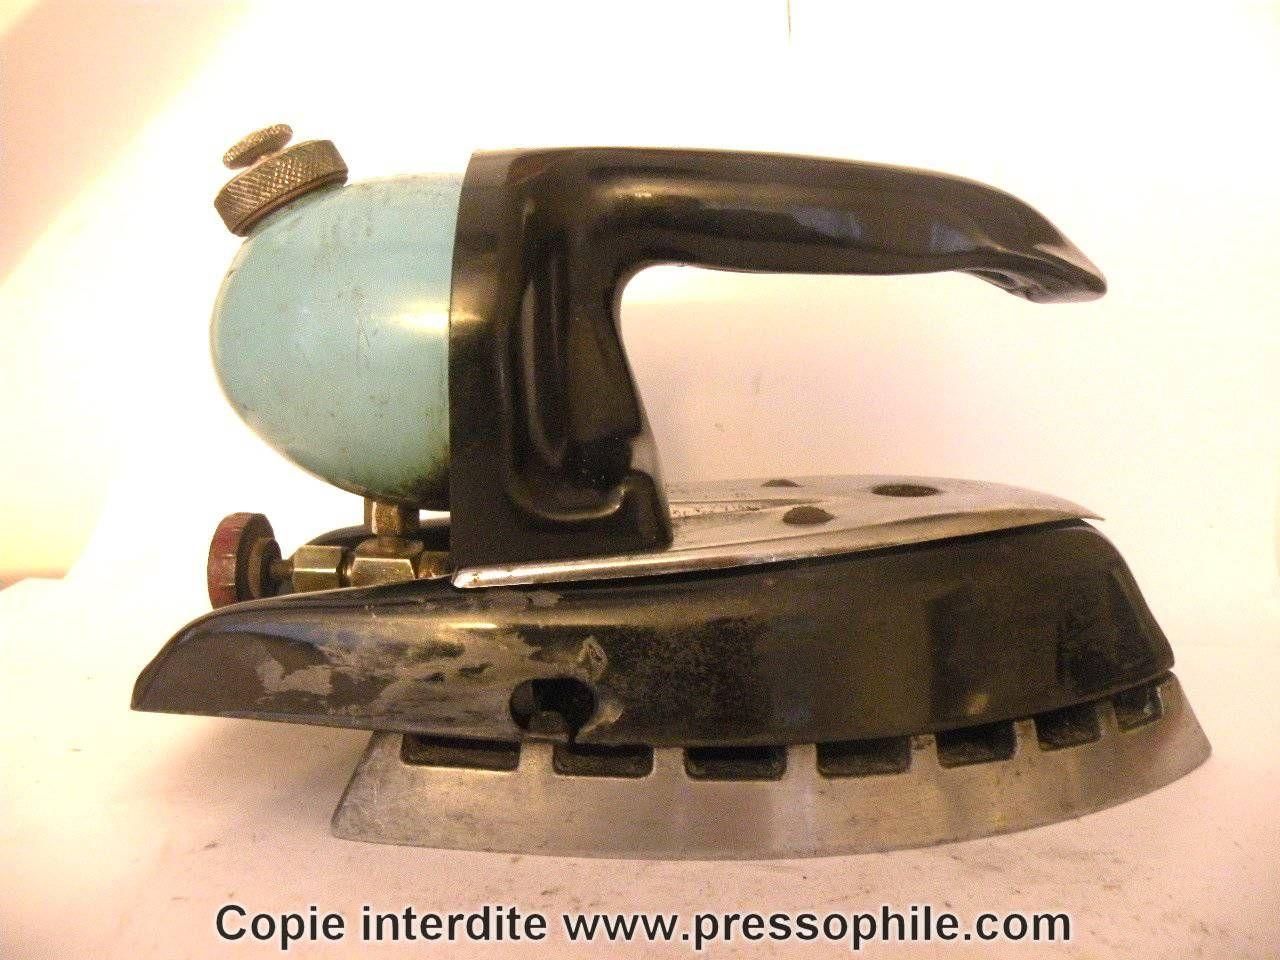 fer repasser coleman 615 au k ros ne canada 1950 antique old irons pinterest iron. Black Bedroom Furniture Sets. Home Design Ideas